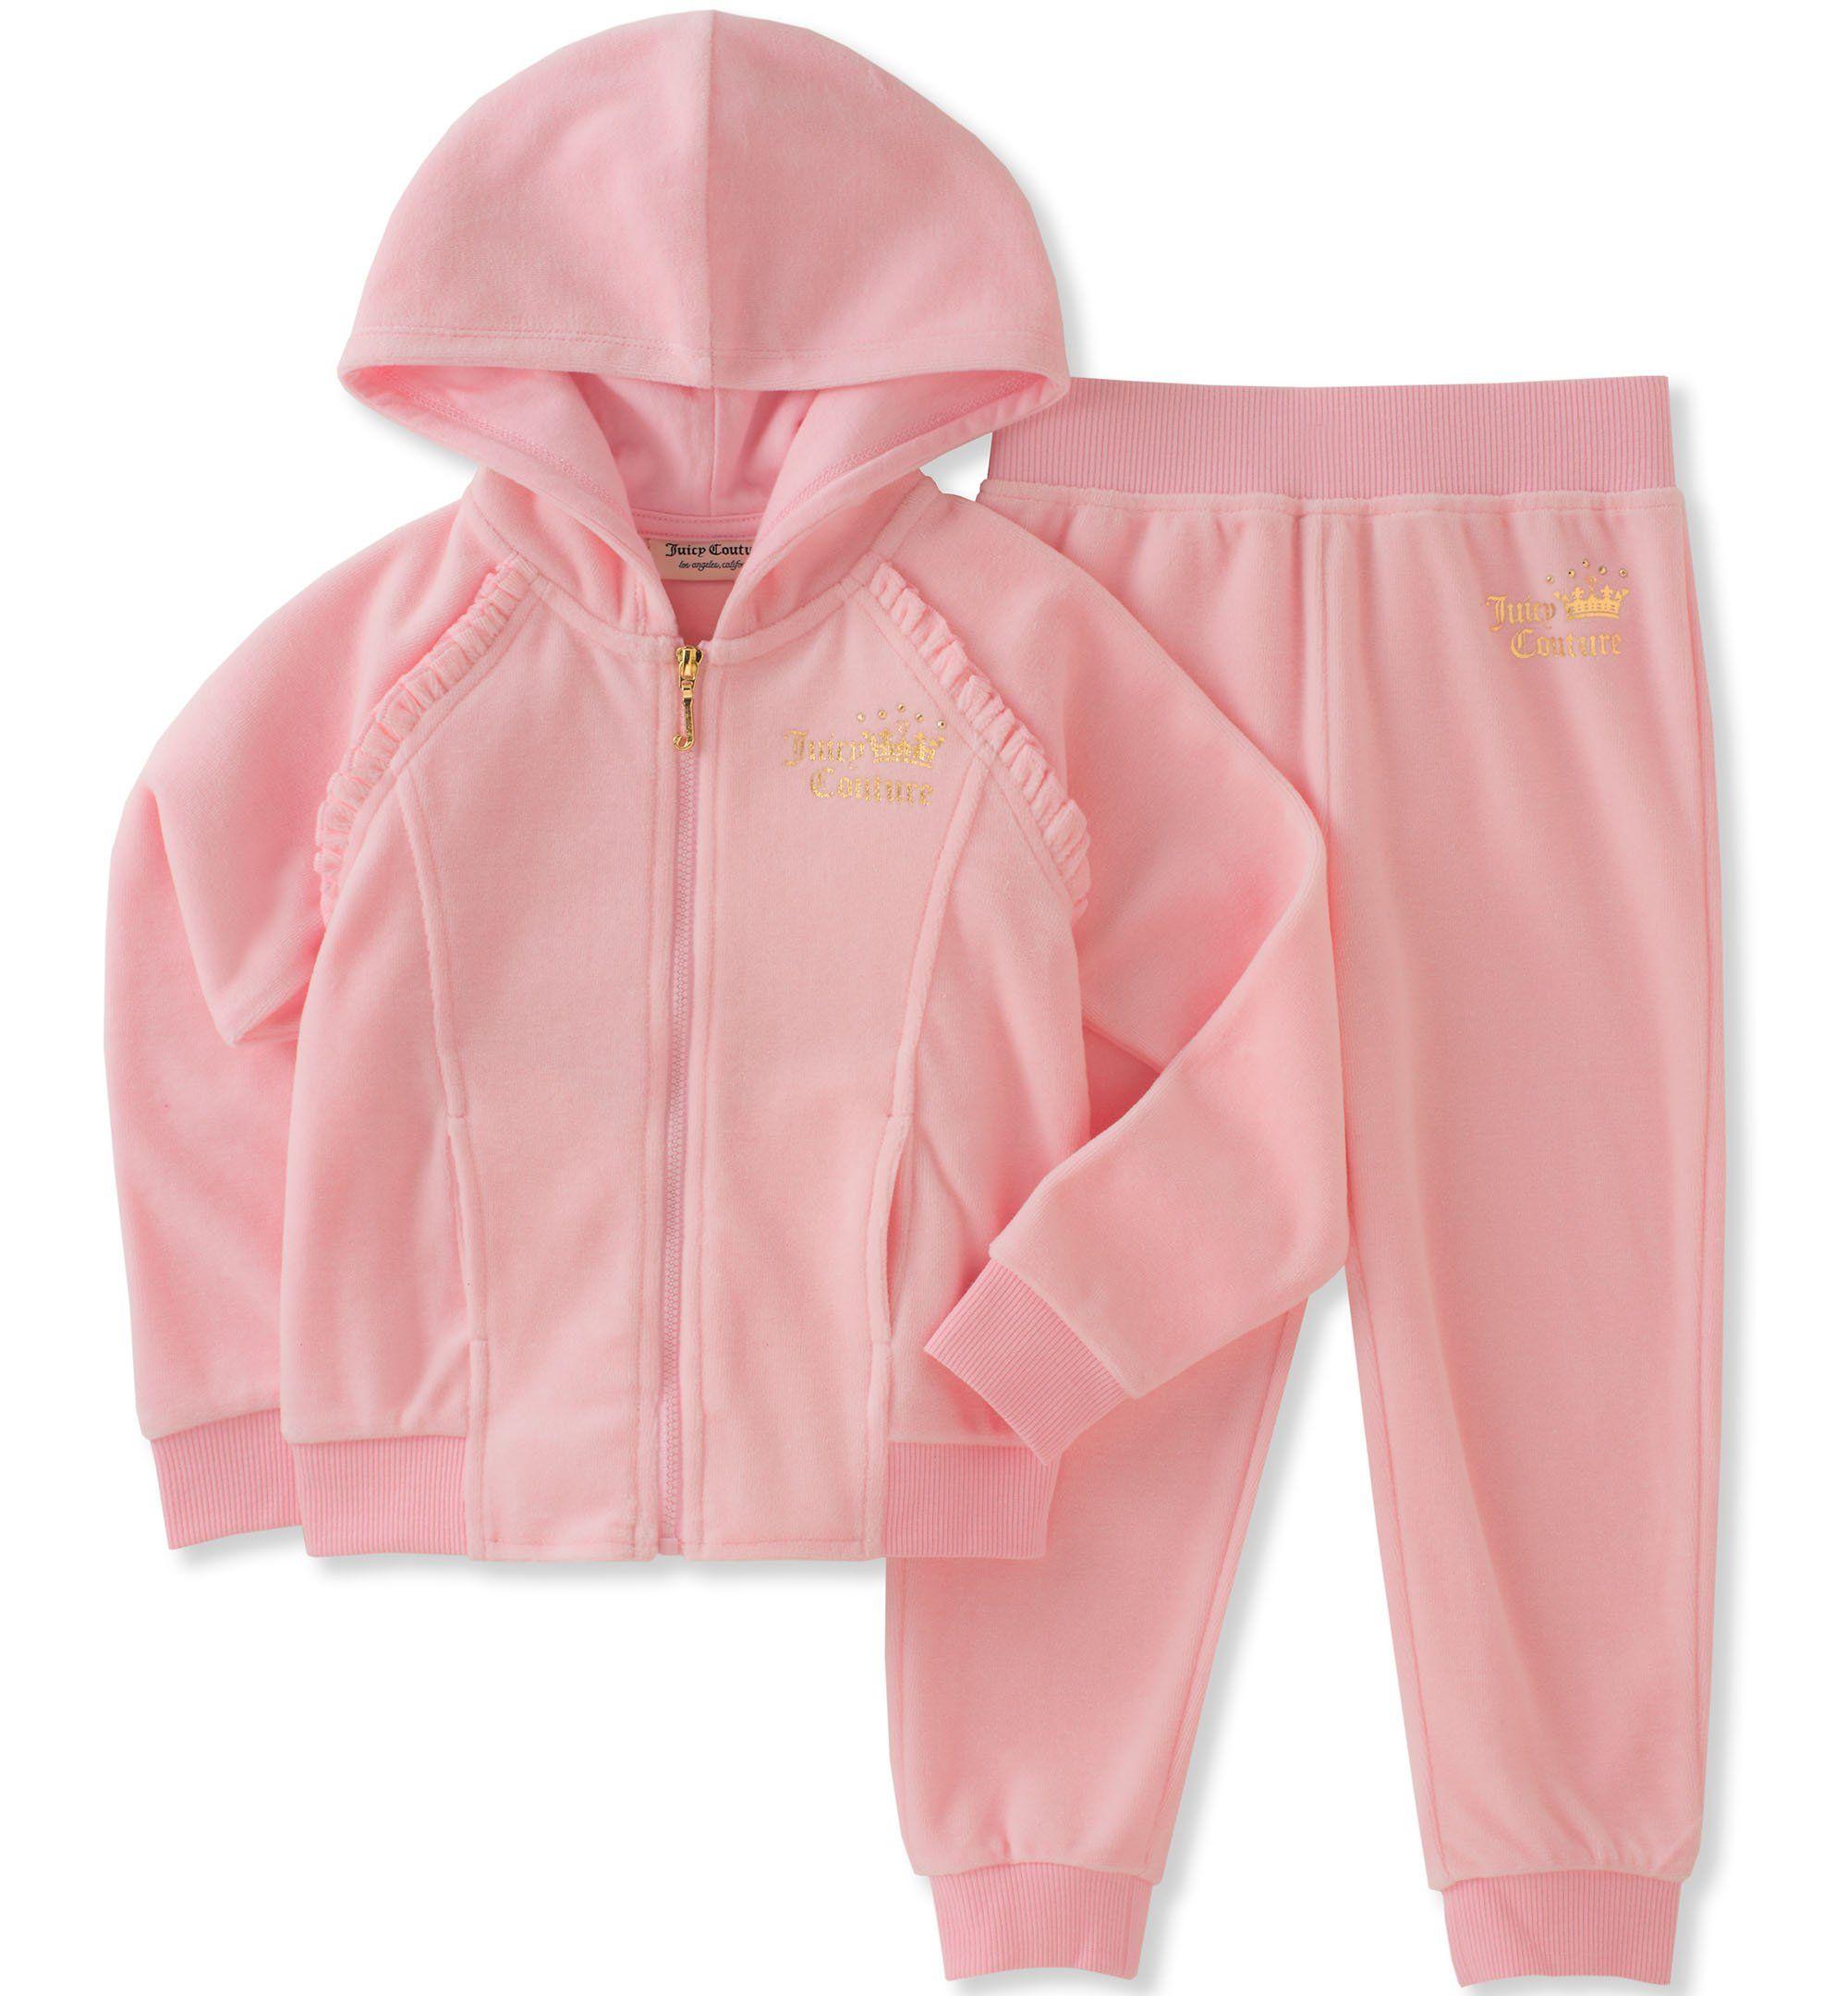 79f6b1dc27 Juicy Couture Toddler Girls' Velour Jog Sets, Light Pink, 3T. Zip ...